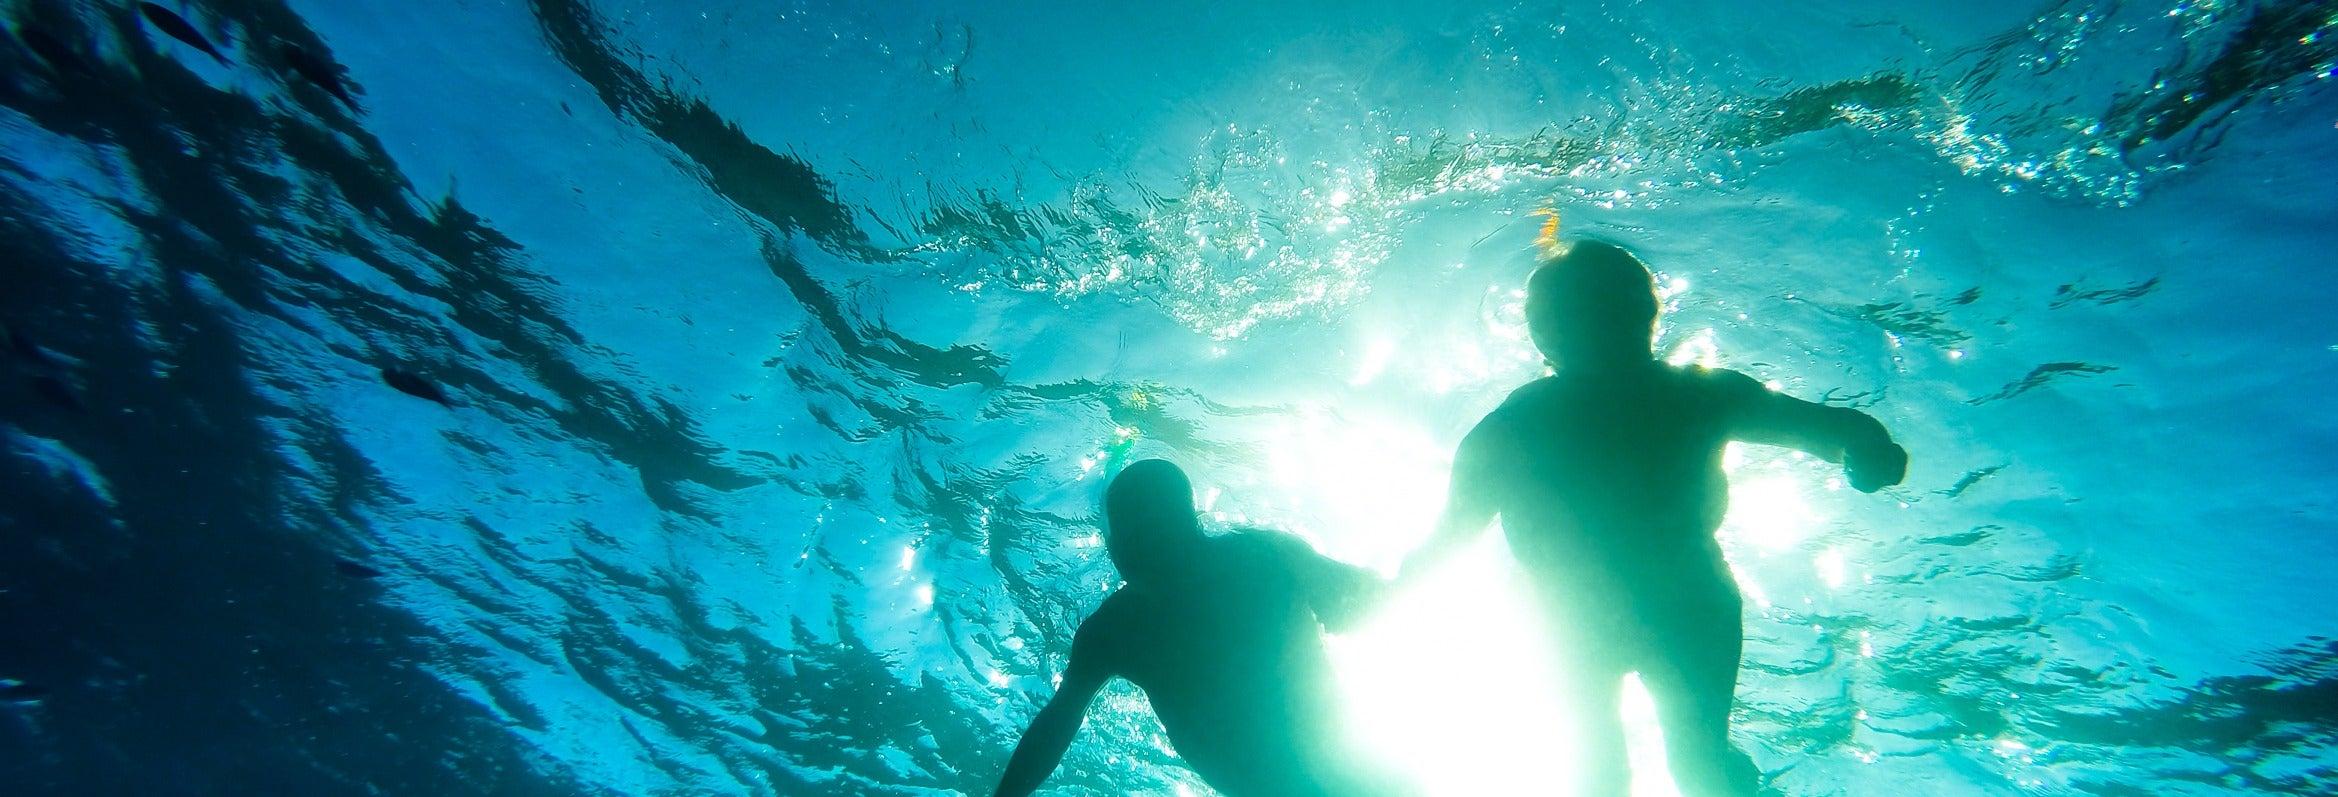 Snorkelling at Mar Menuda Beach